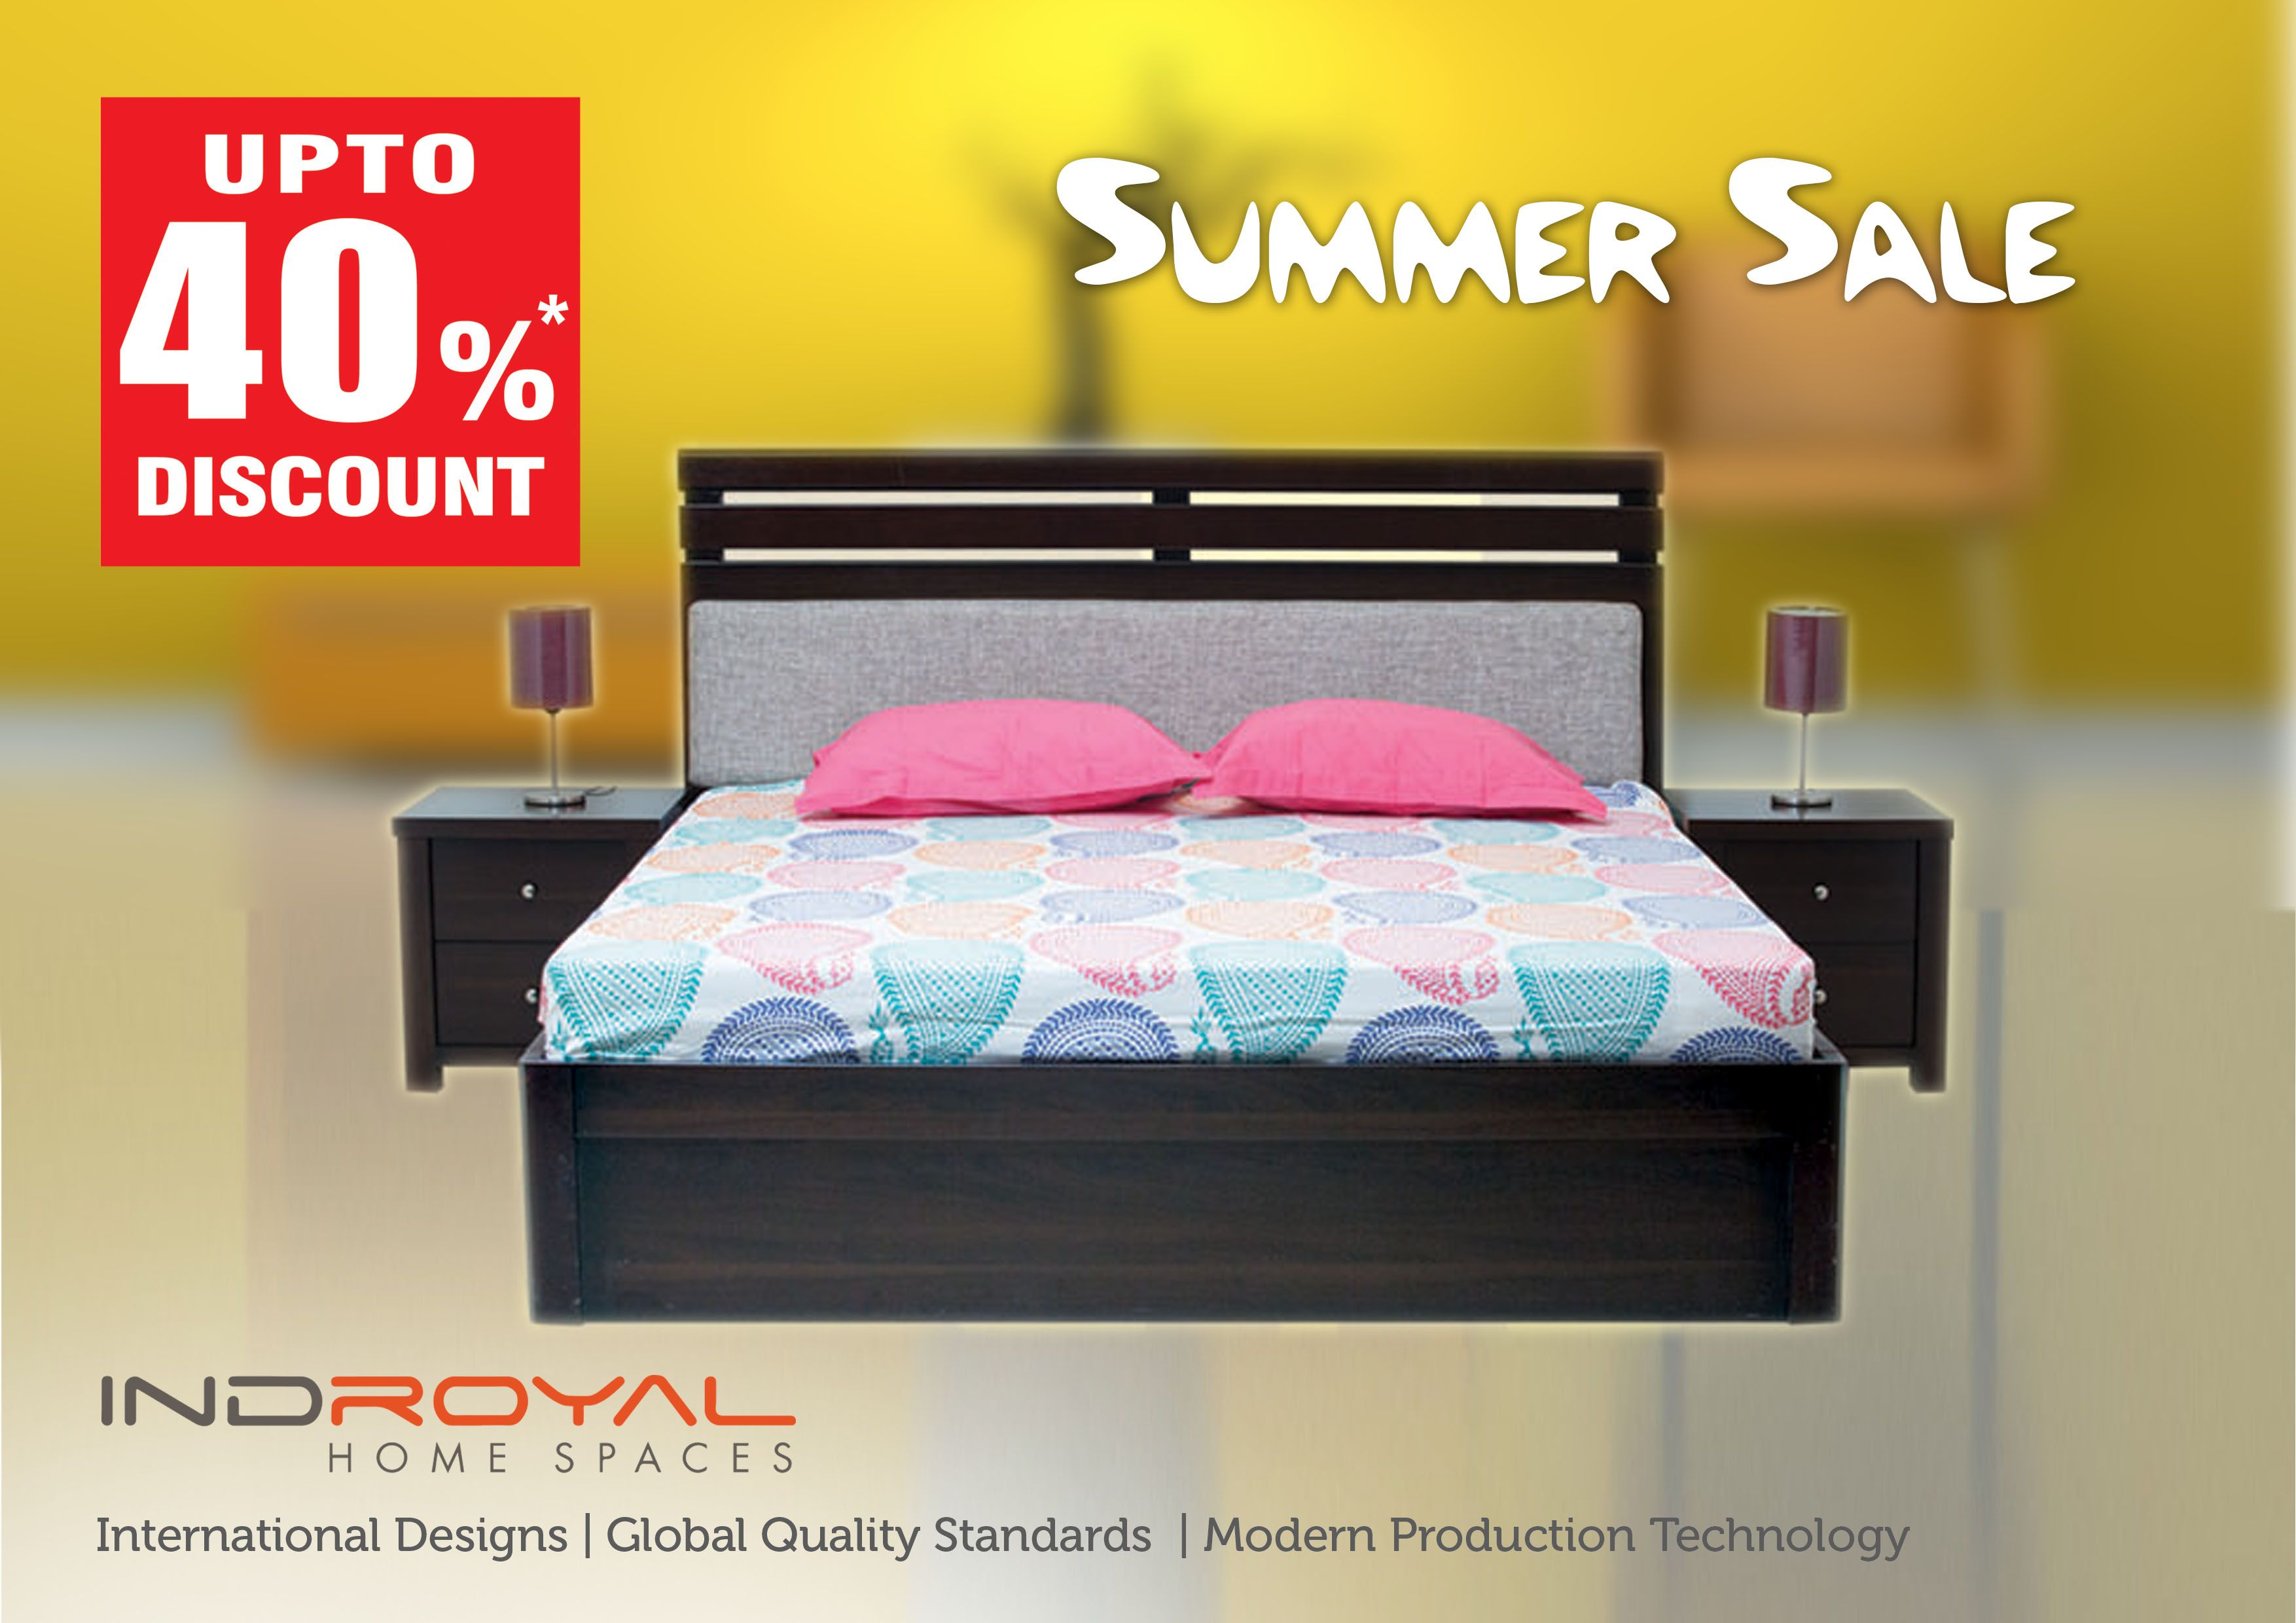 Indroyal Summer Sale Offer Enjoy Savings Of Up To On - Indroyal bedroom furniture